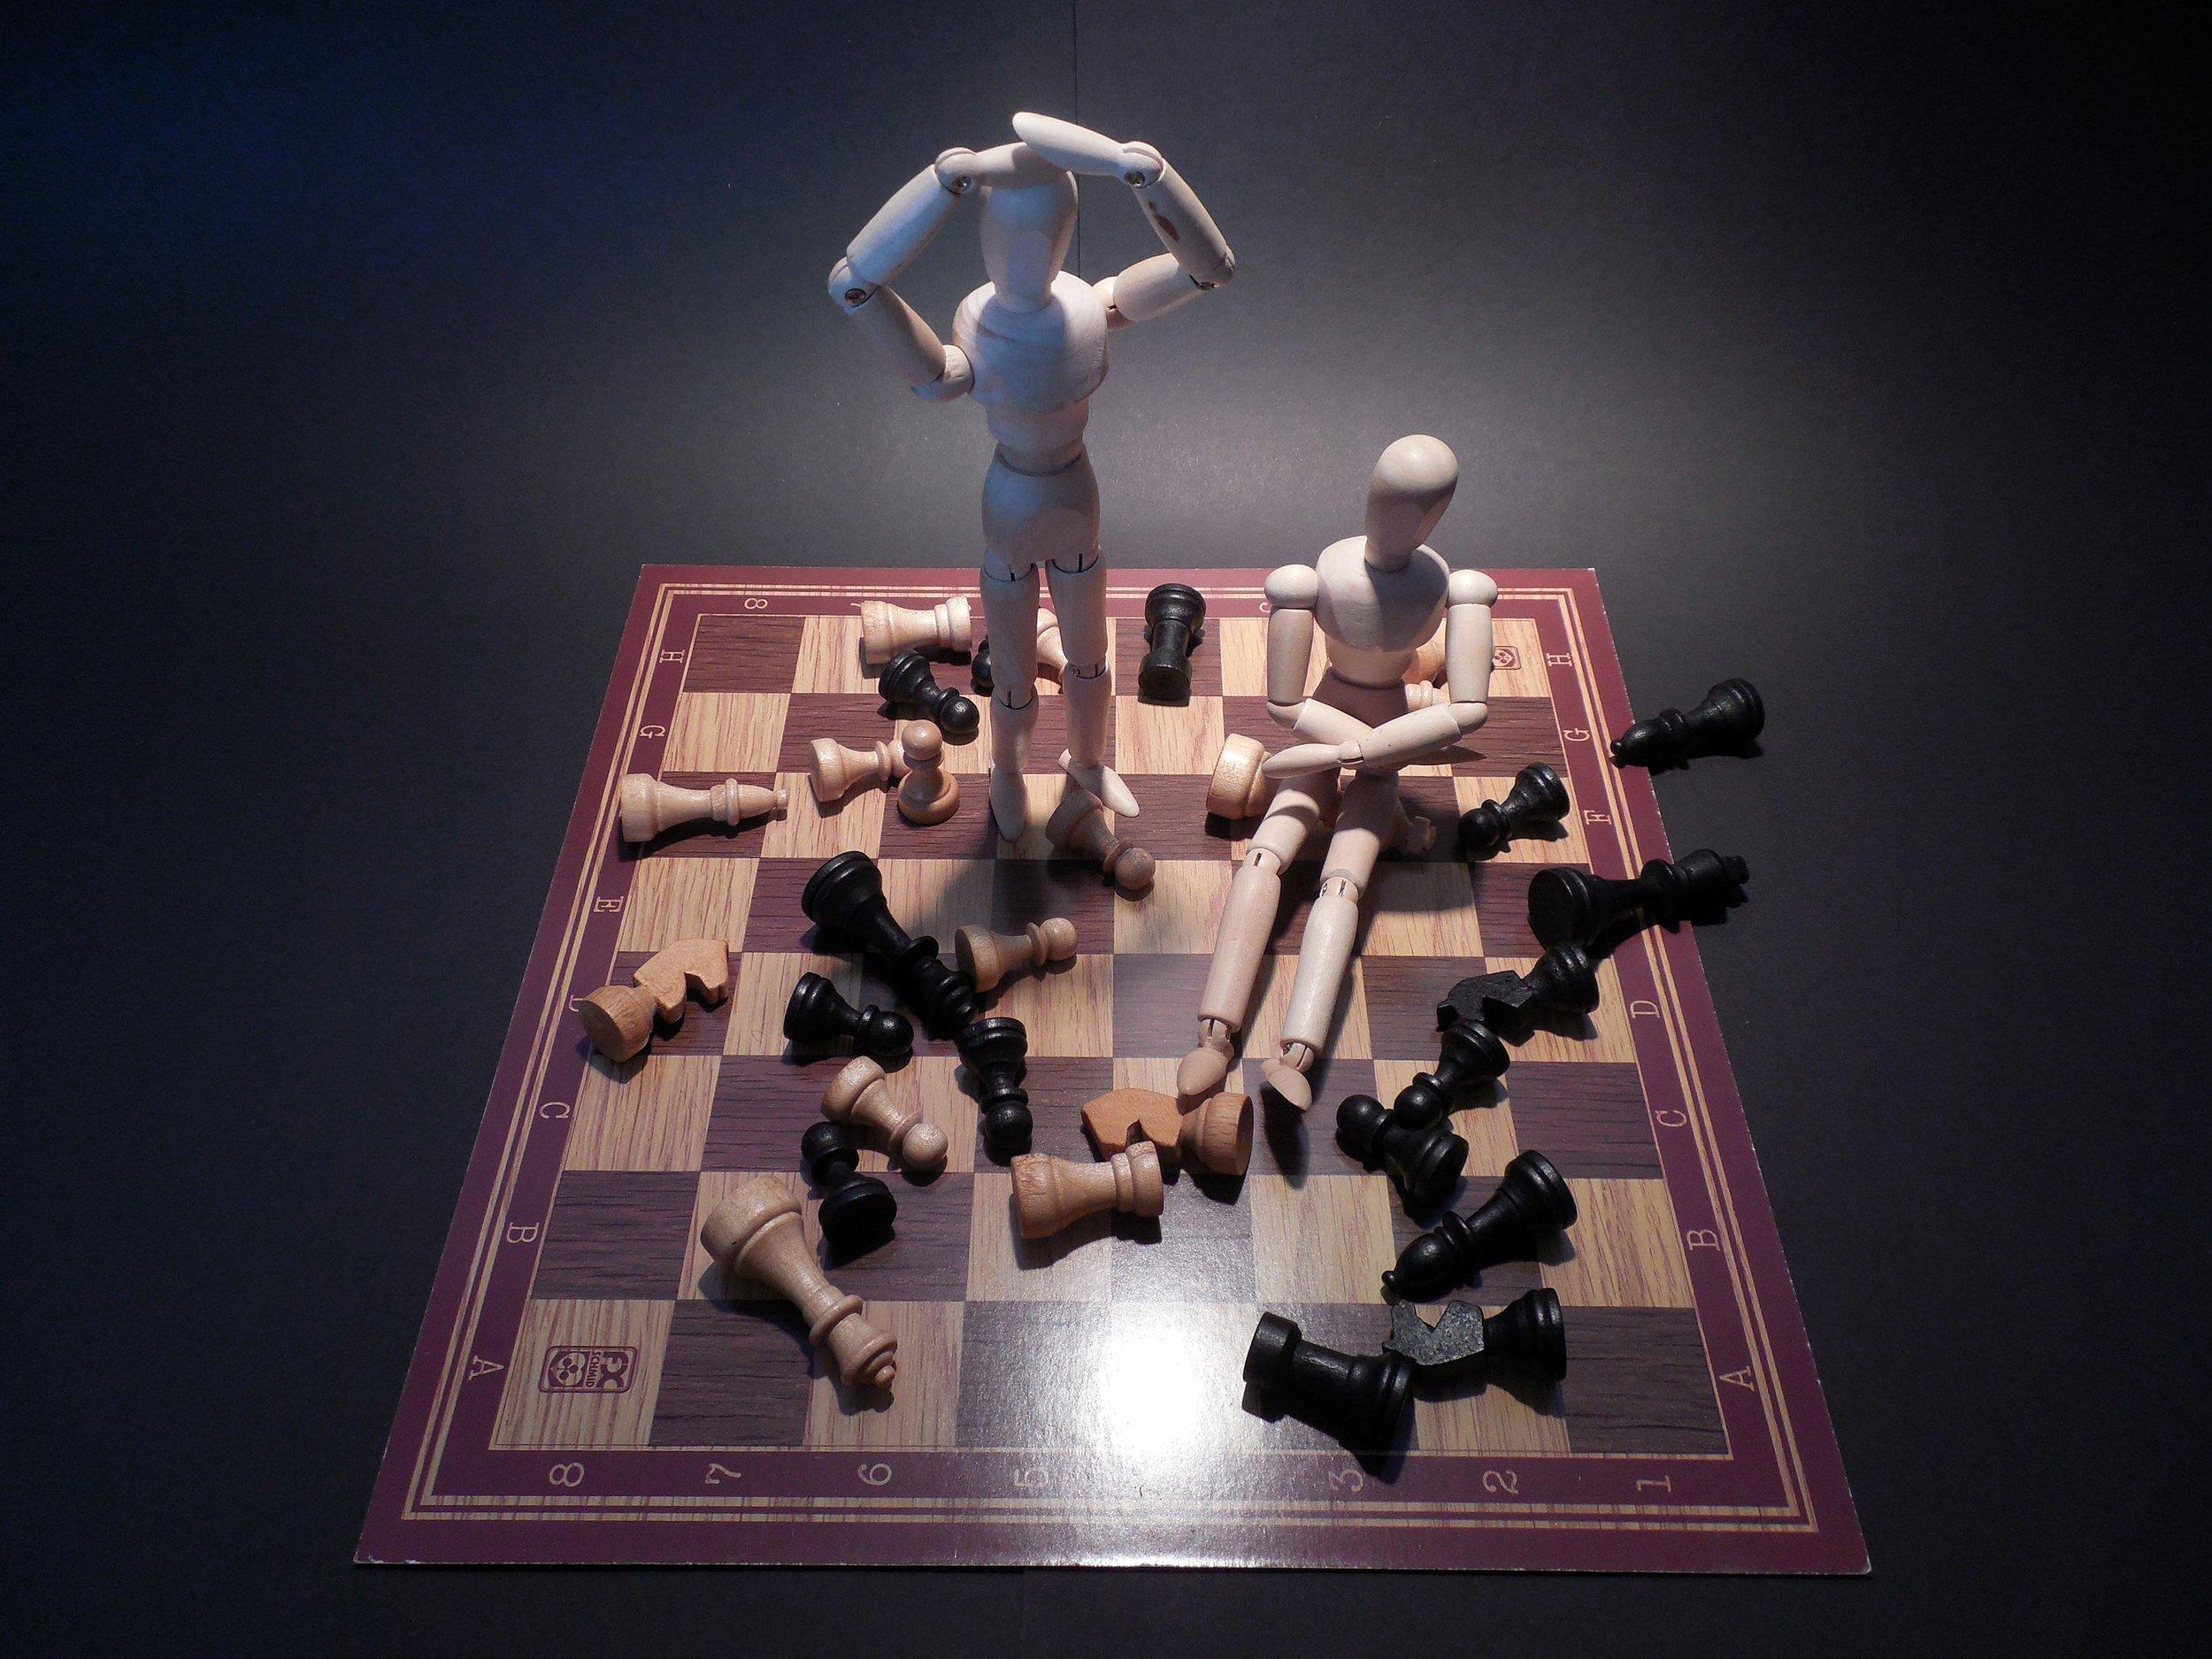 board-game-business-challenge-277052.jpg